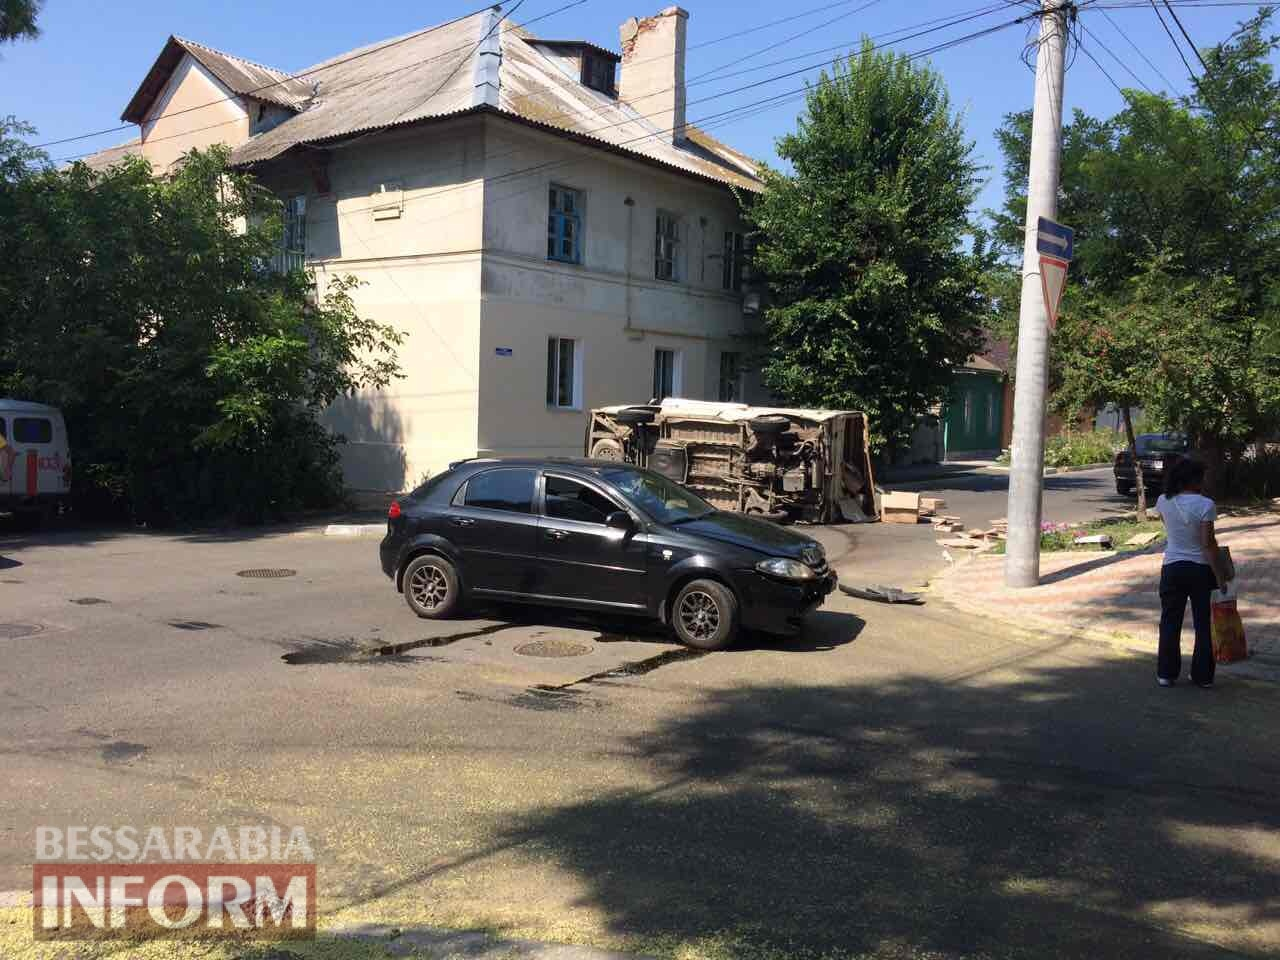 ДТП в Измаиле: Chevrolet Lacetti завалил на бок грузовой микроавтобус